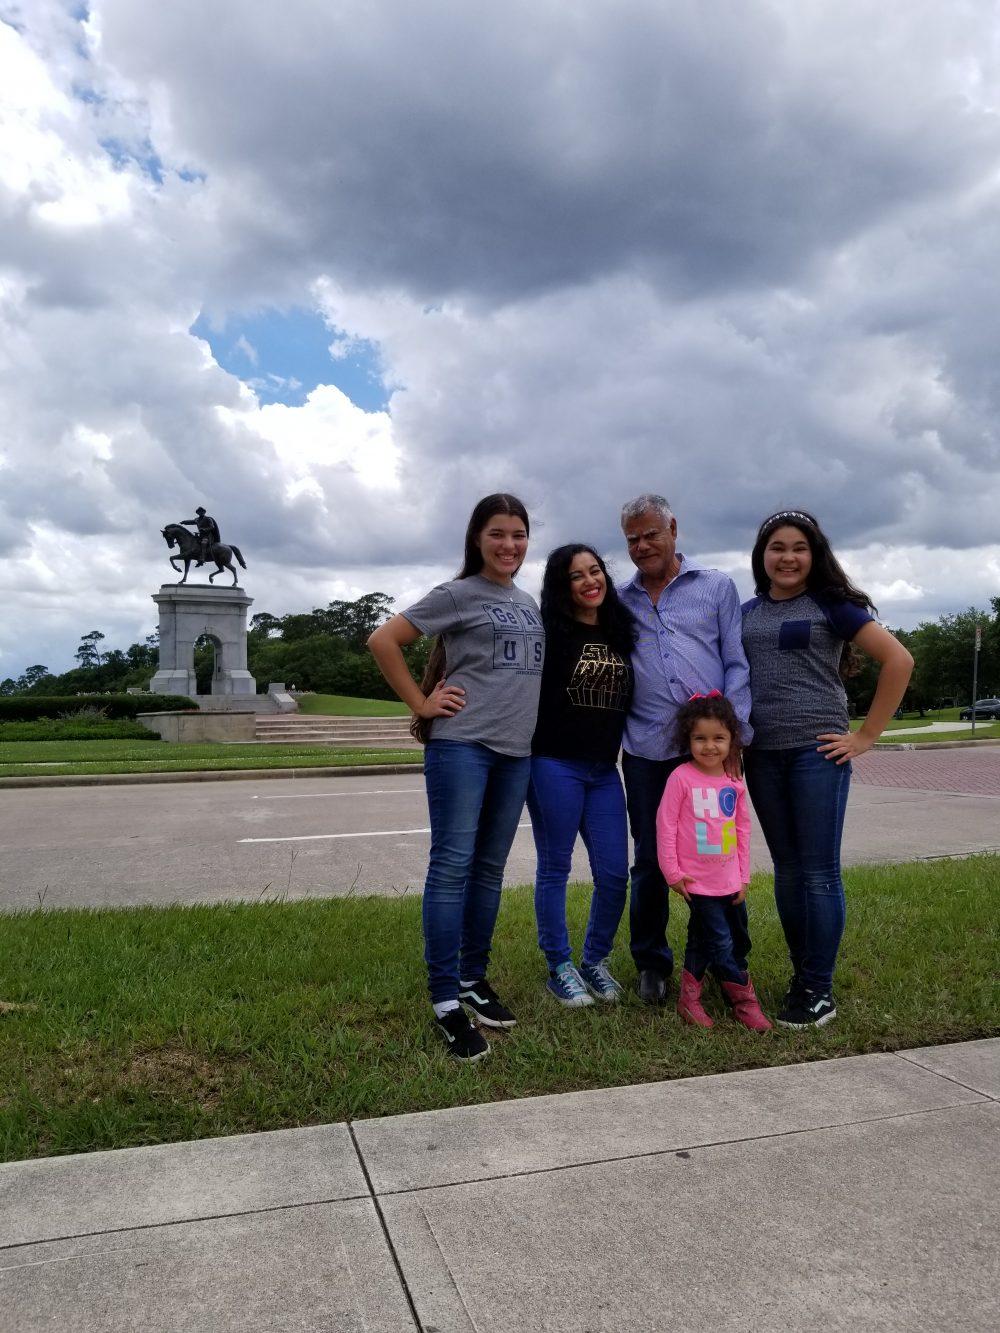 Visit Houston Sam Houston Statue Houston Museum Of Natural Science